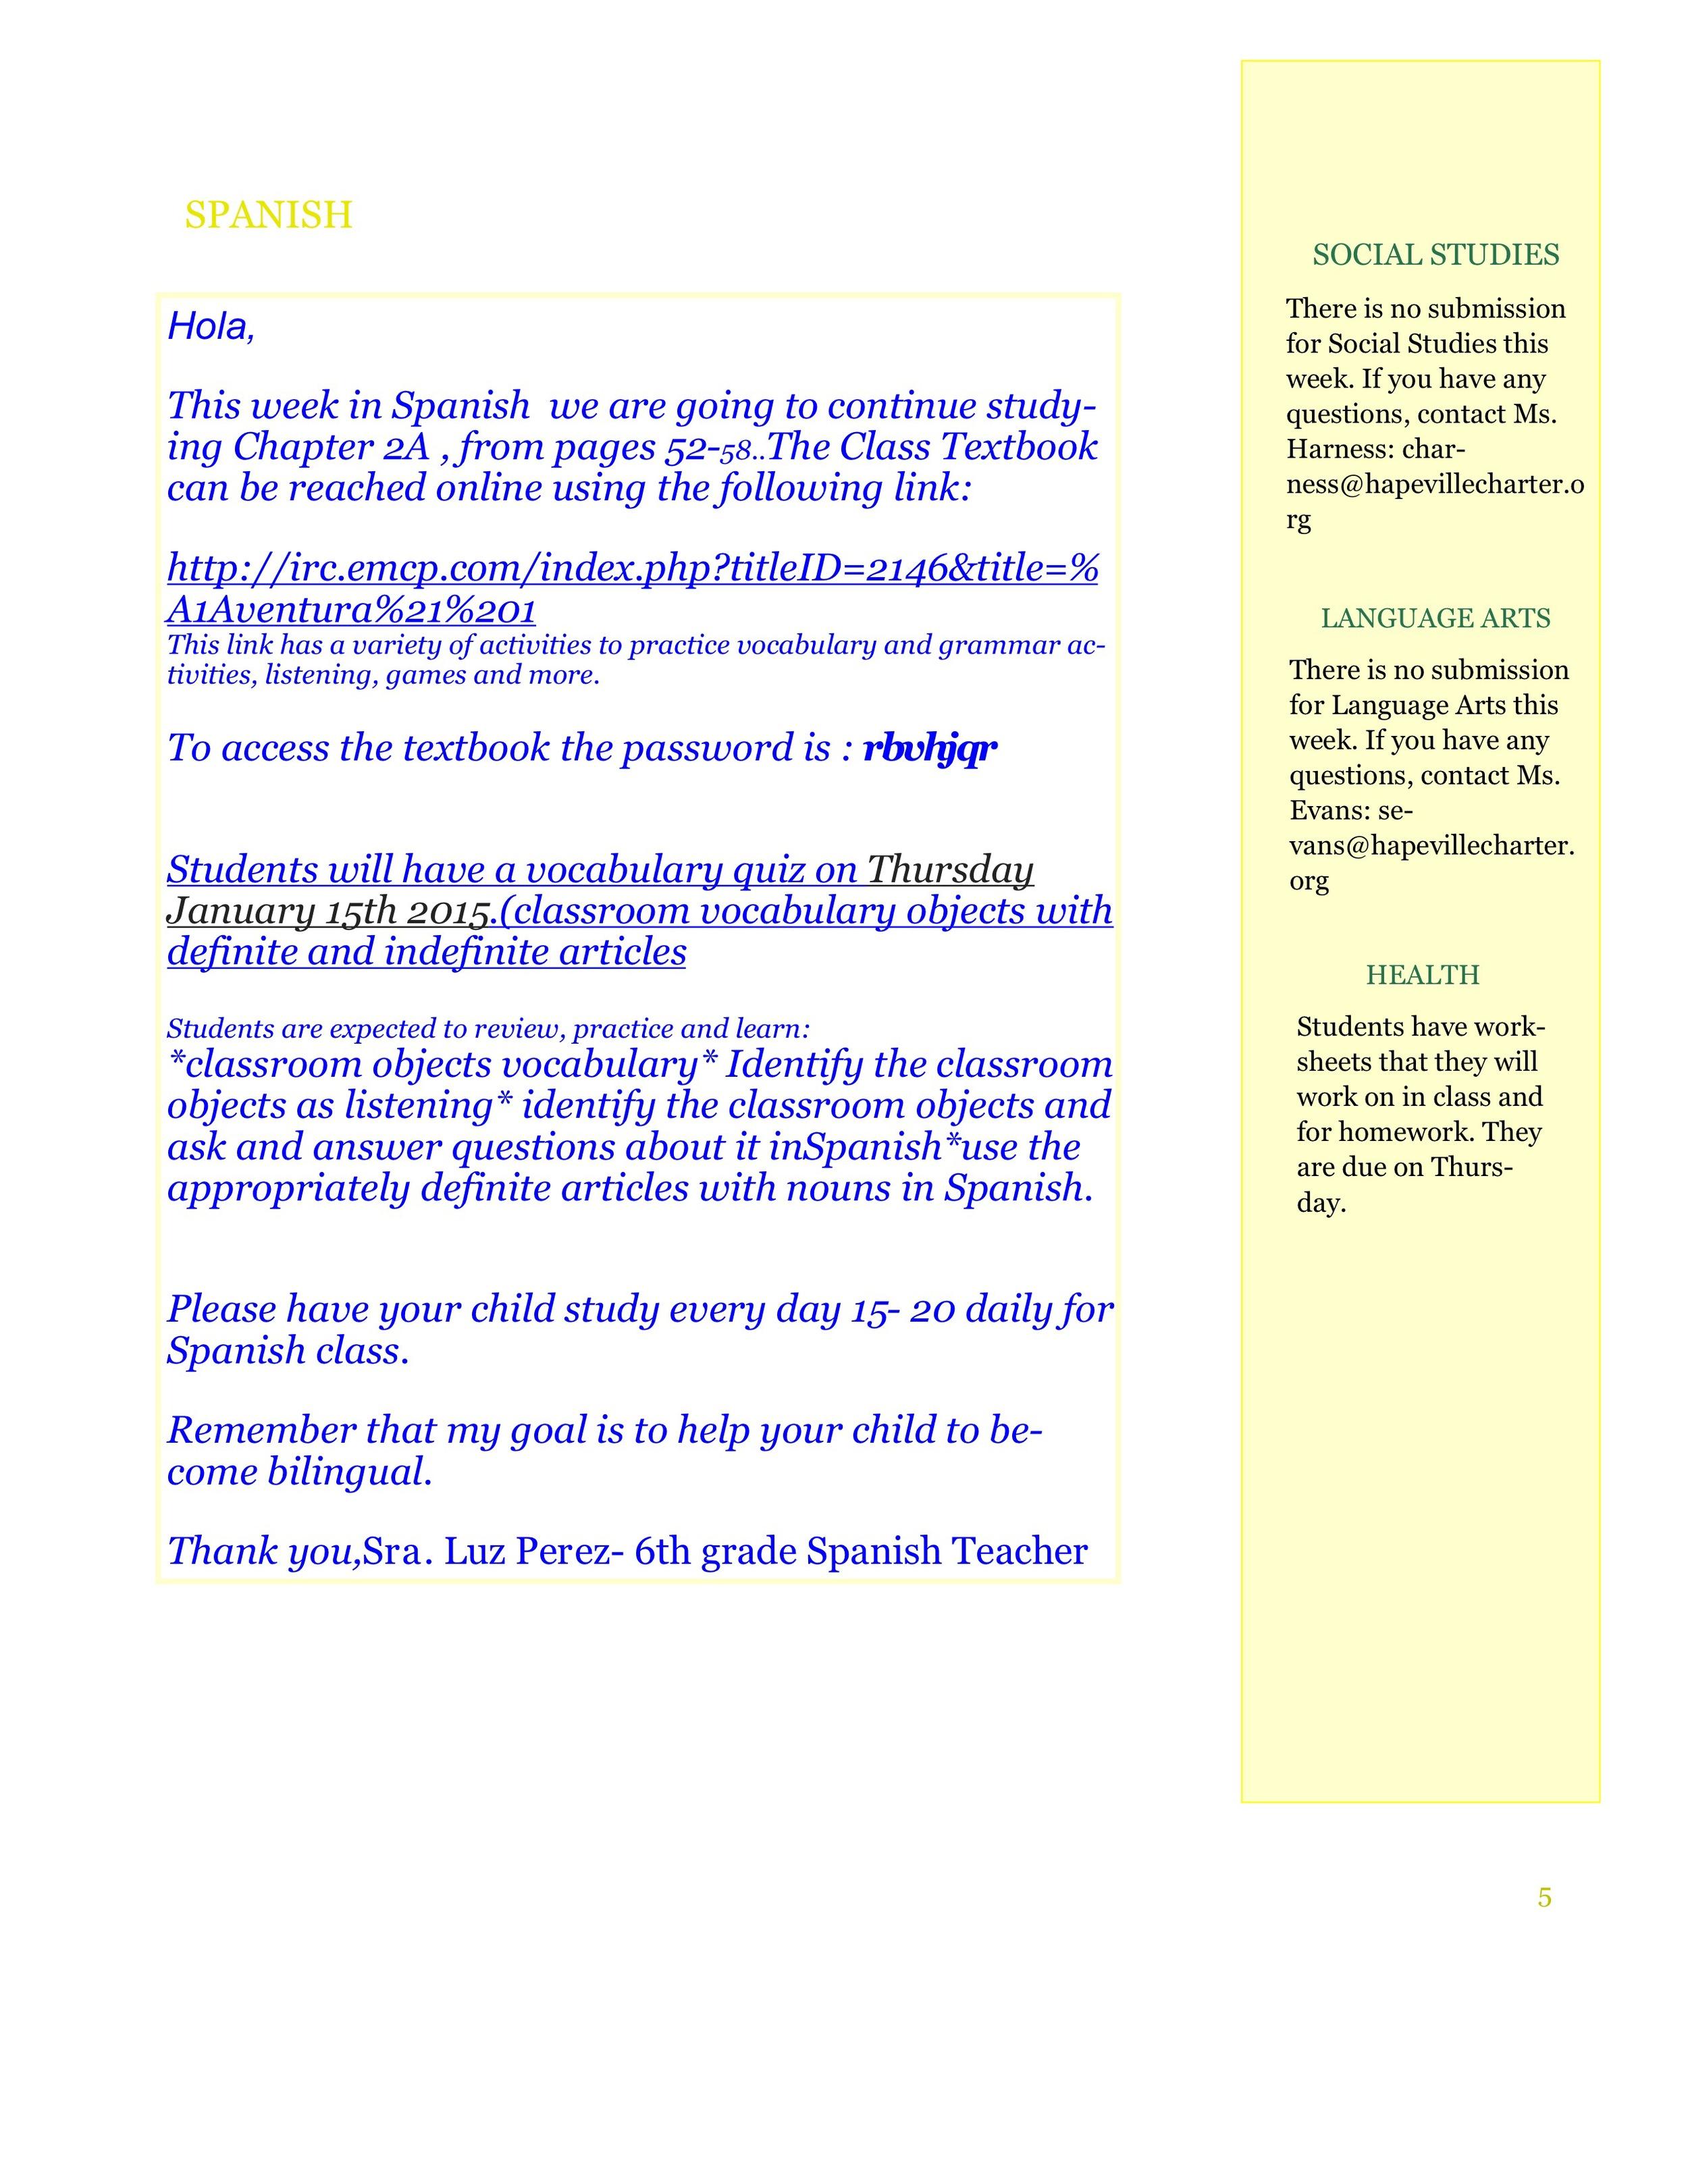 Newsletter Image6th grade January 12-16 5.jpeg